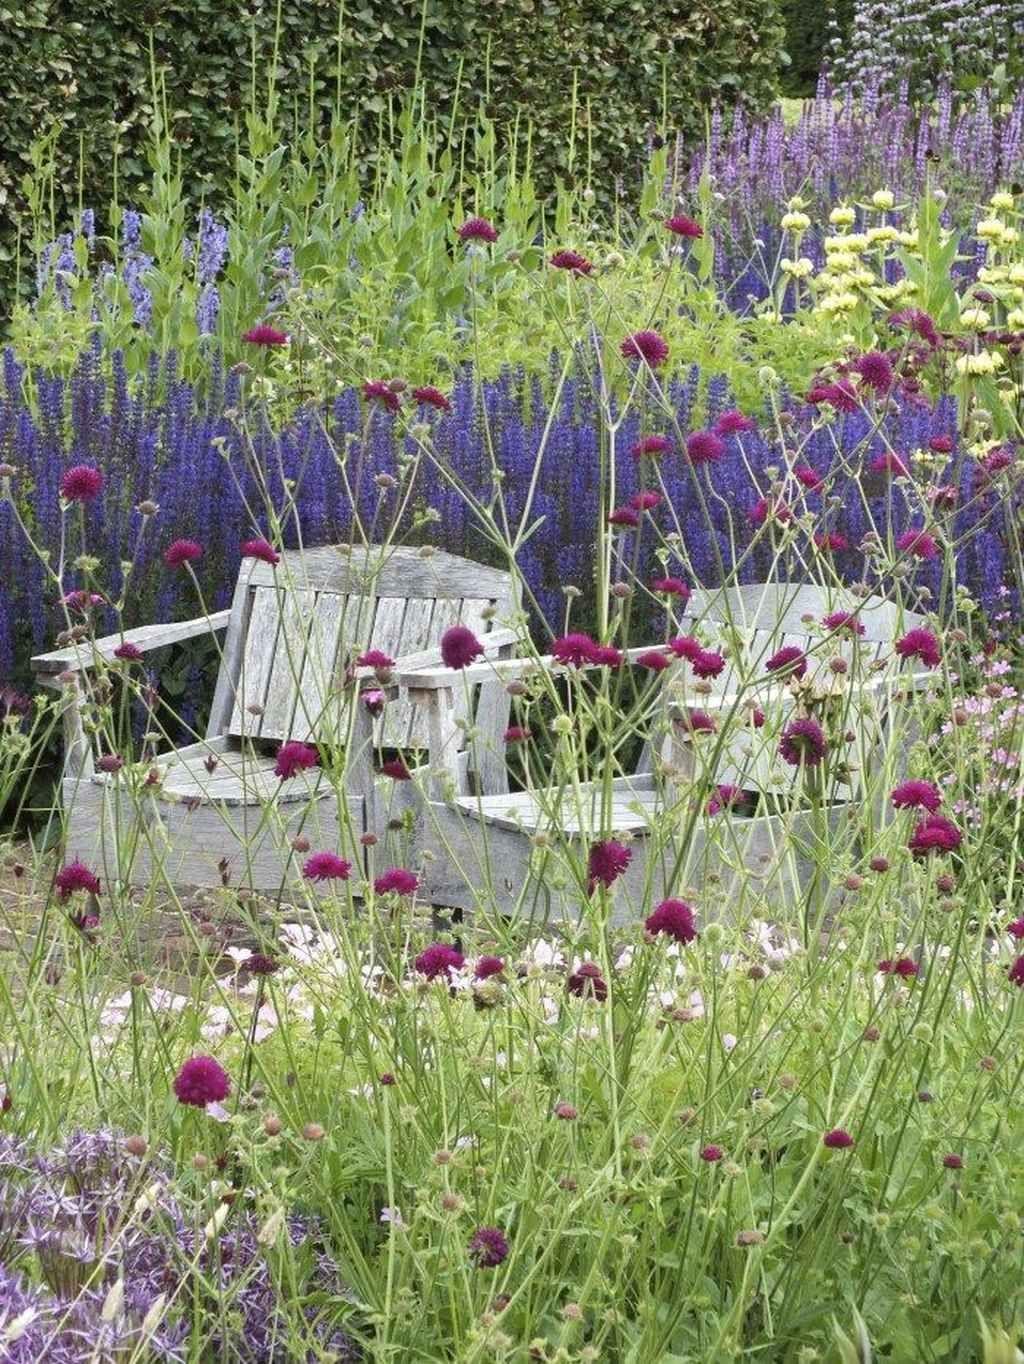 95 Stunning Small Cottage Garden Ideas For Backyard Inspiration Structhome Com Nice 95 Stunning Small Cottage Garten Landschaftsbau Cottage Garten Garten